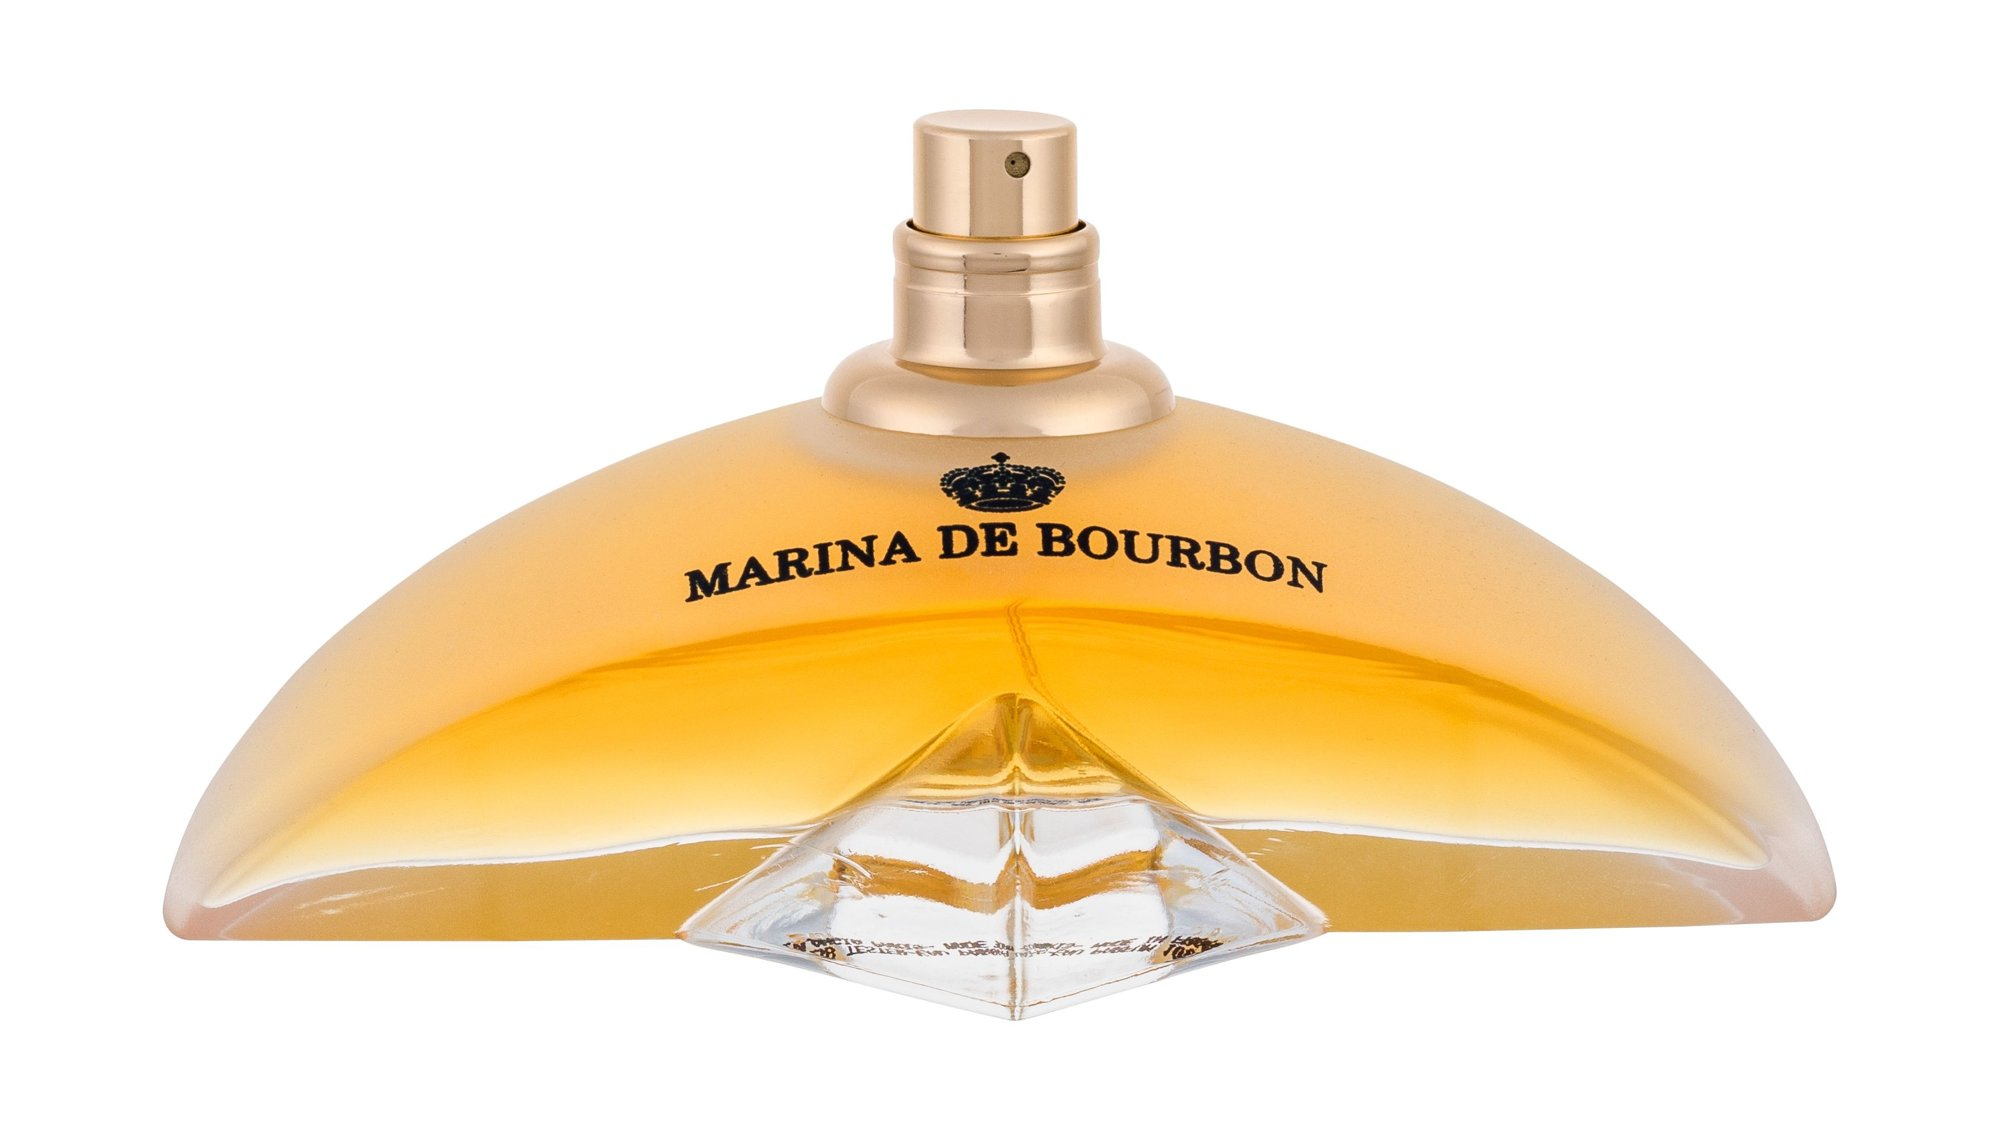 Marina de Bourbon Marina de Bourbon Eau de Parfum 100ml